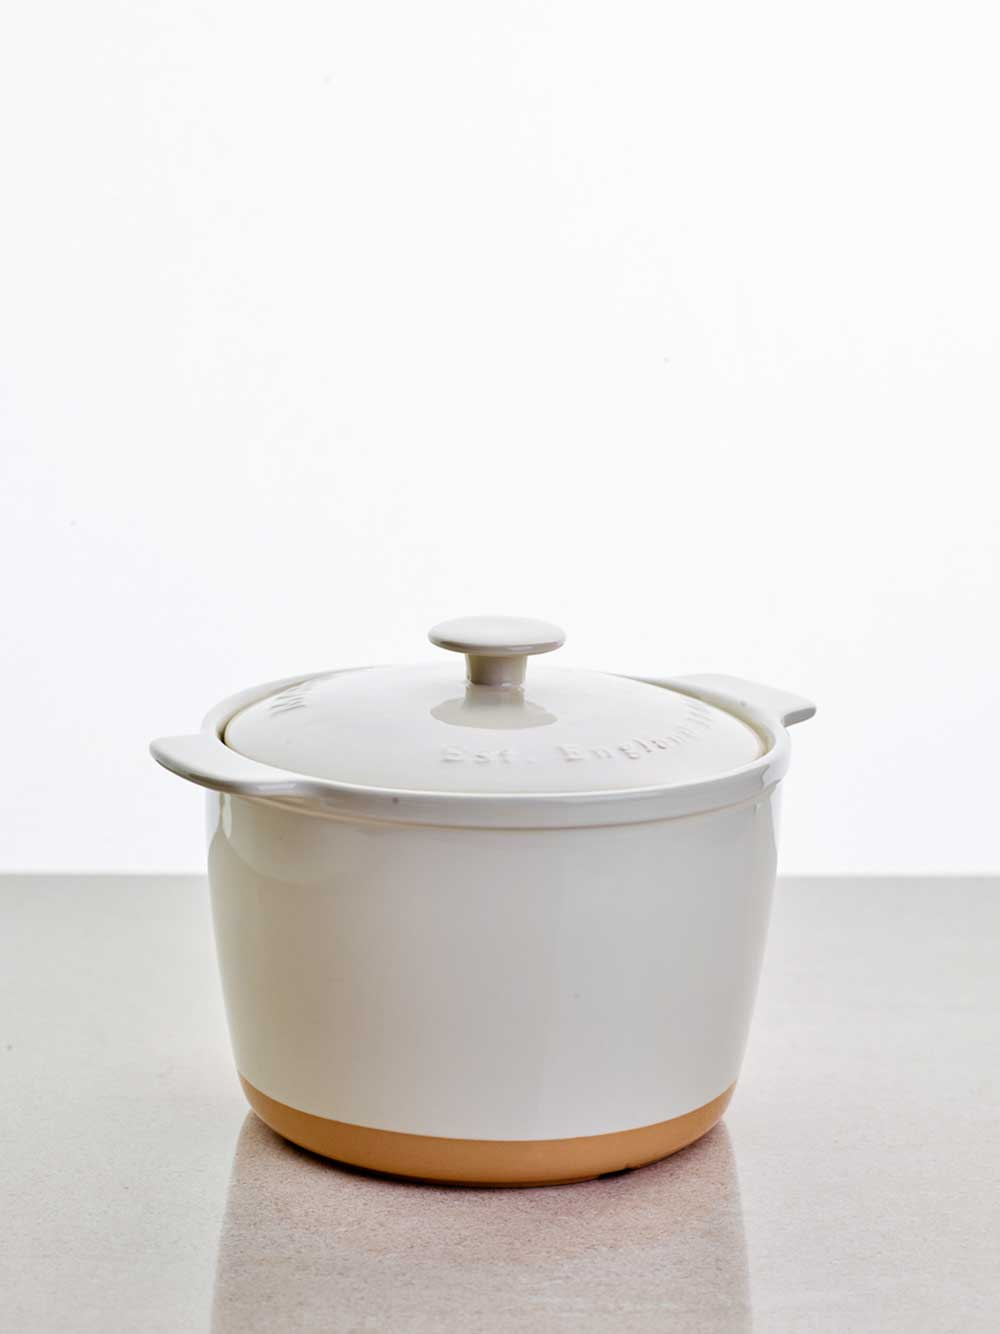 Servera currykycklingen i en keramikgryta.